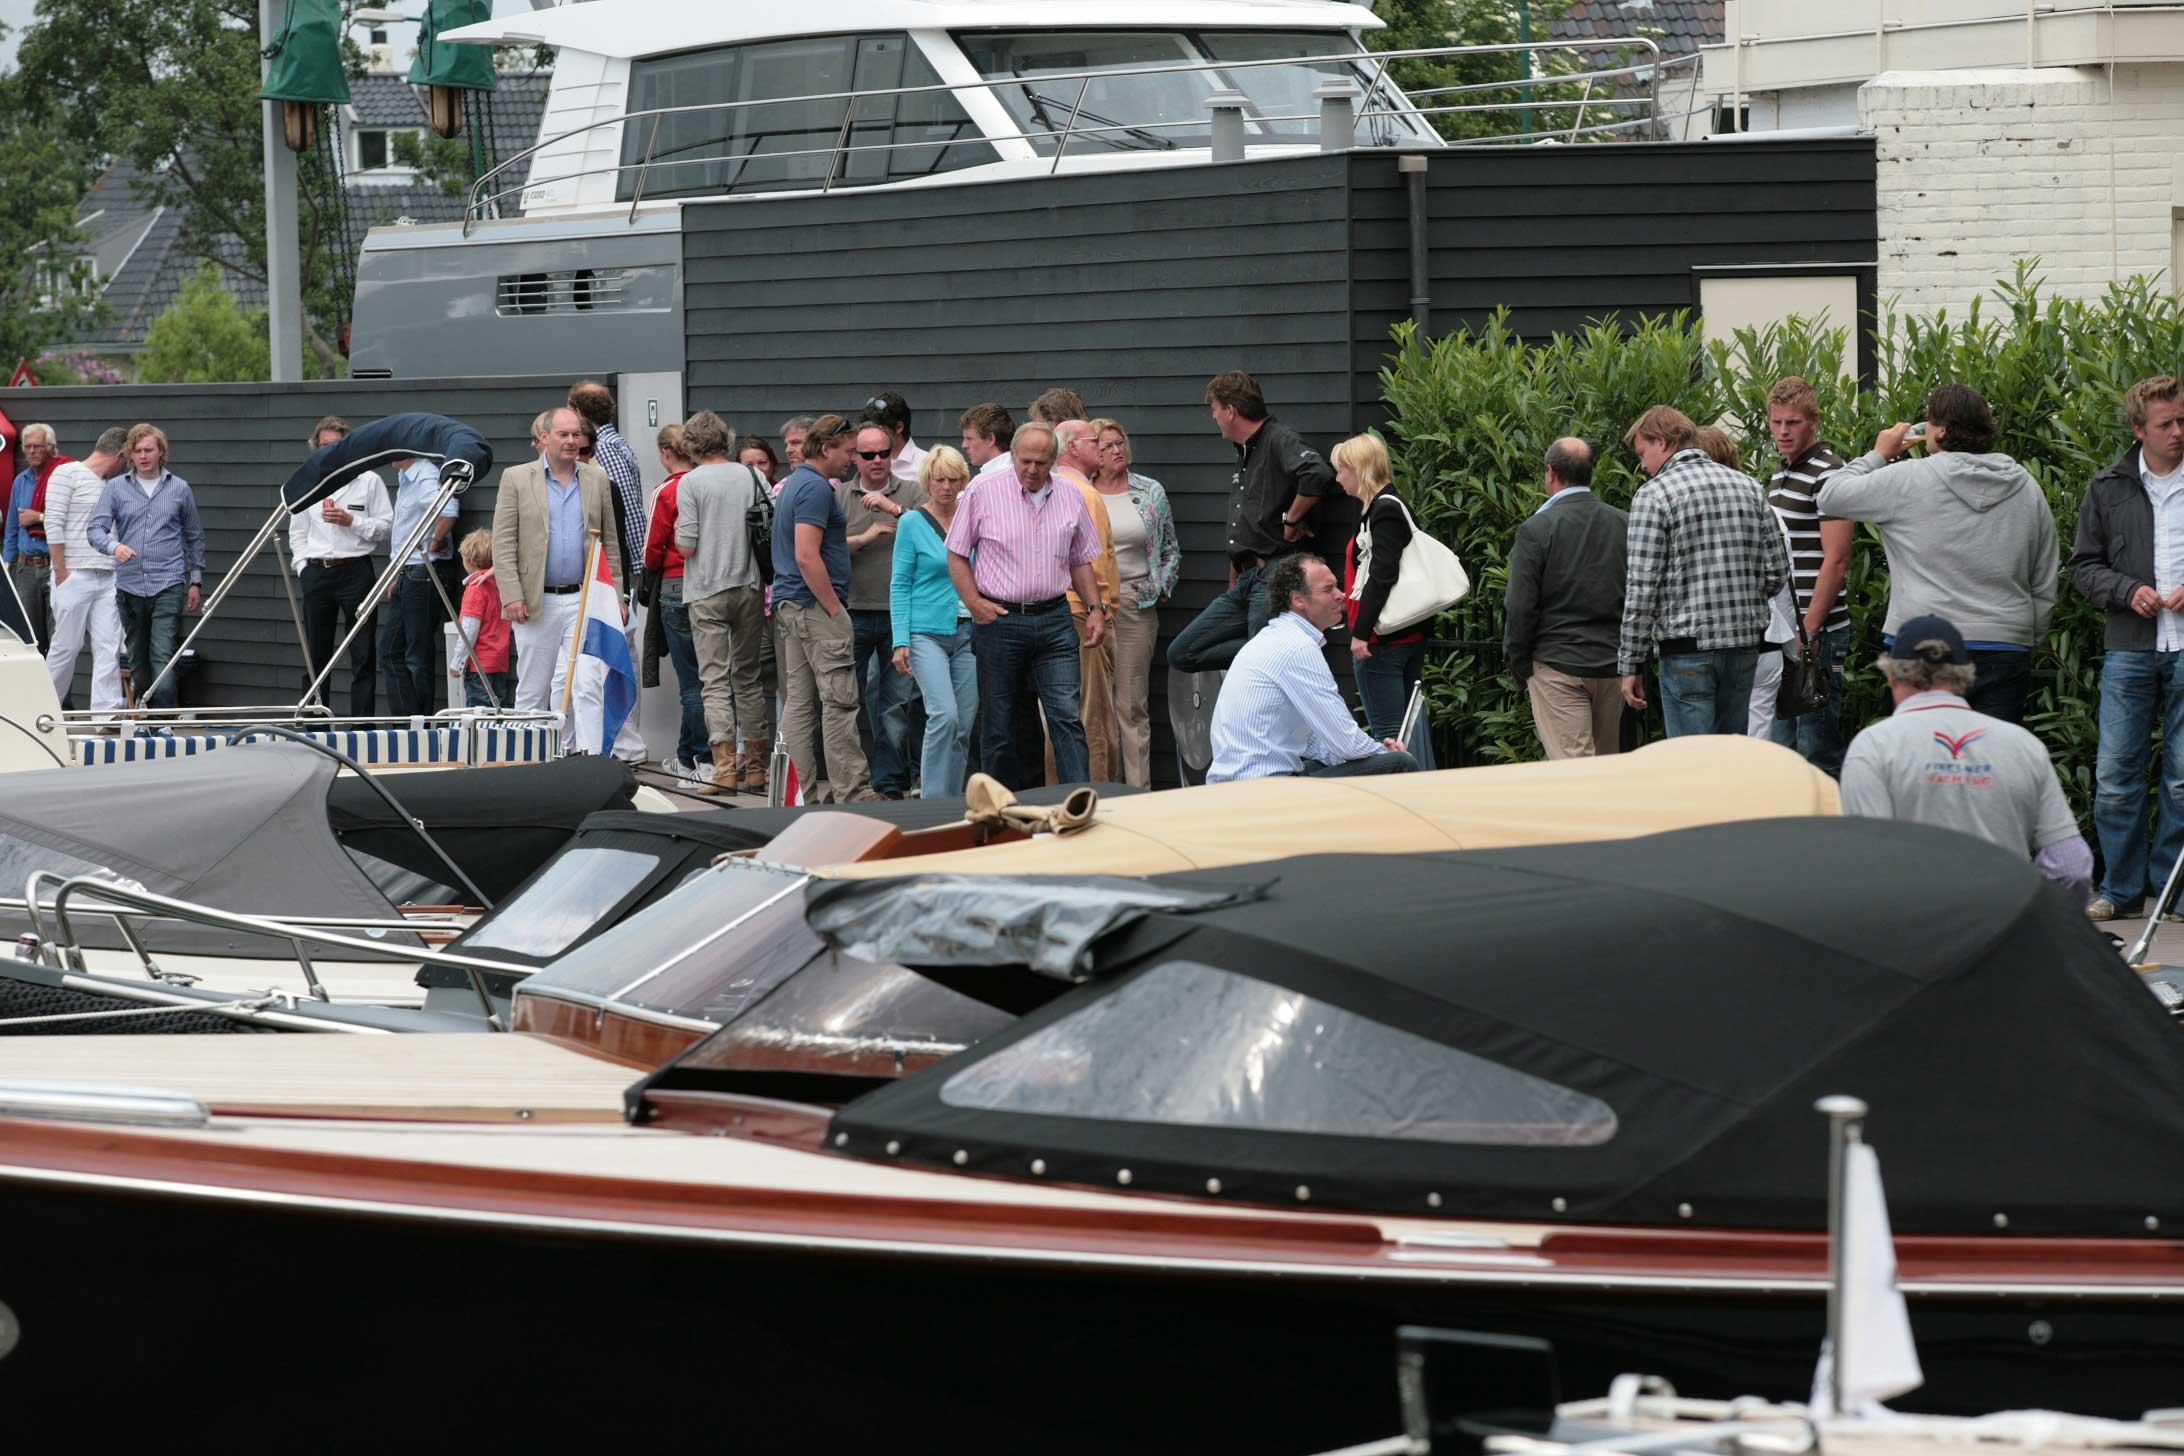 IMG_0194-Yachts-&-lifestyle-boten-en-mensen